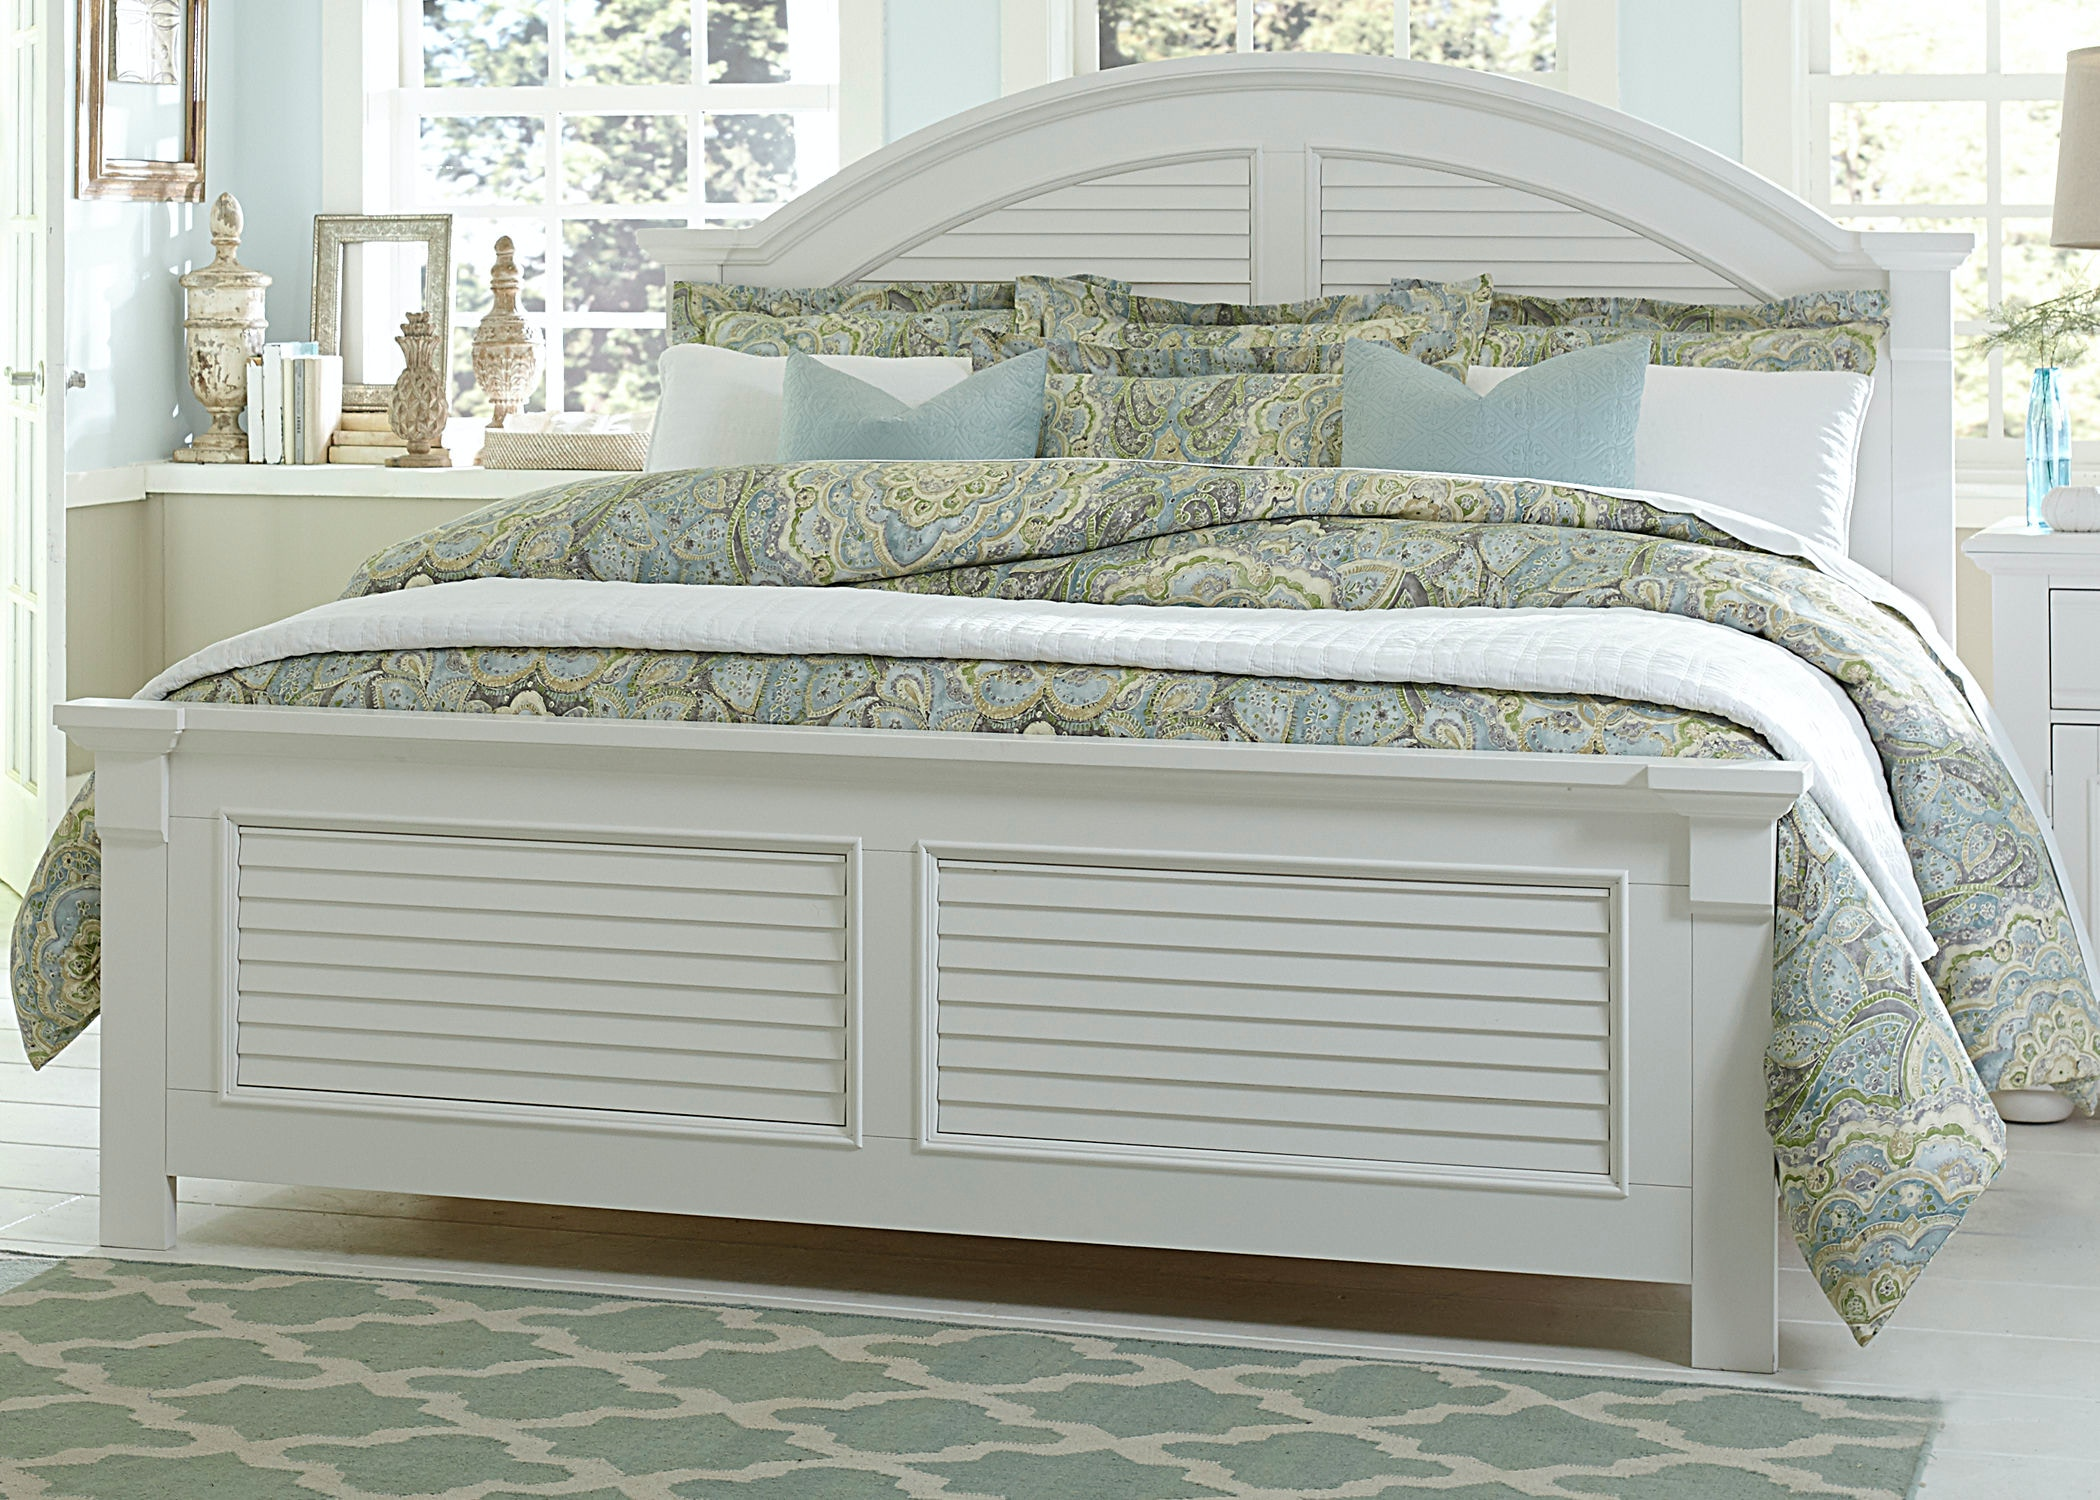 Elegant Liberty Furniture Bedroom Queen Panel Headboard 607 BR13 At D Noblin  Furniture